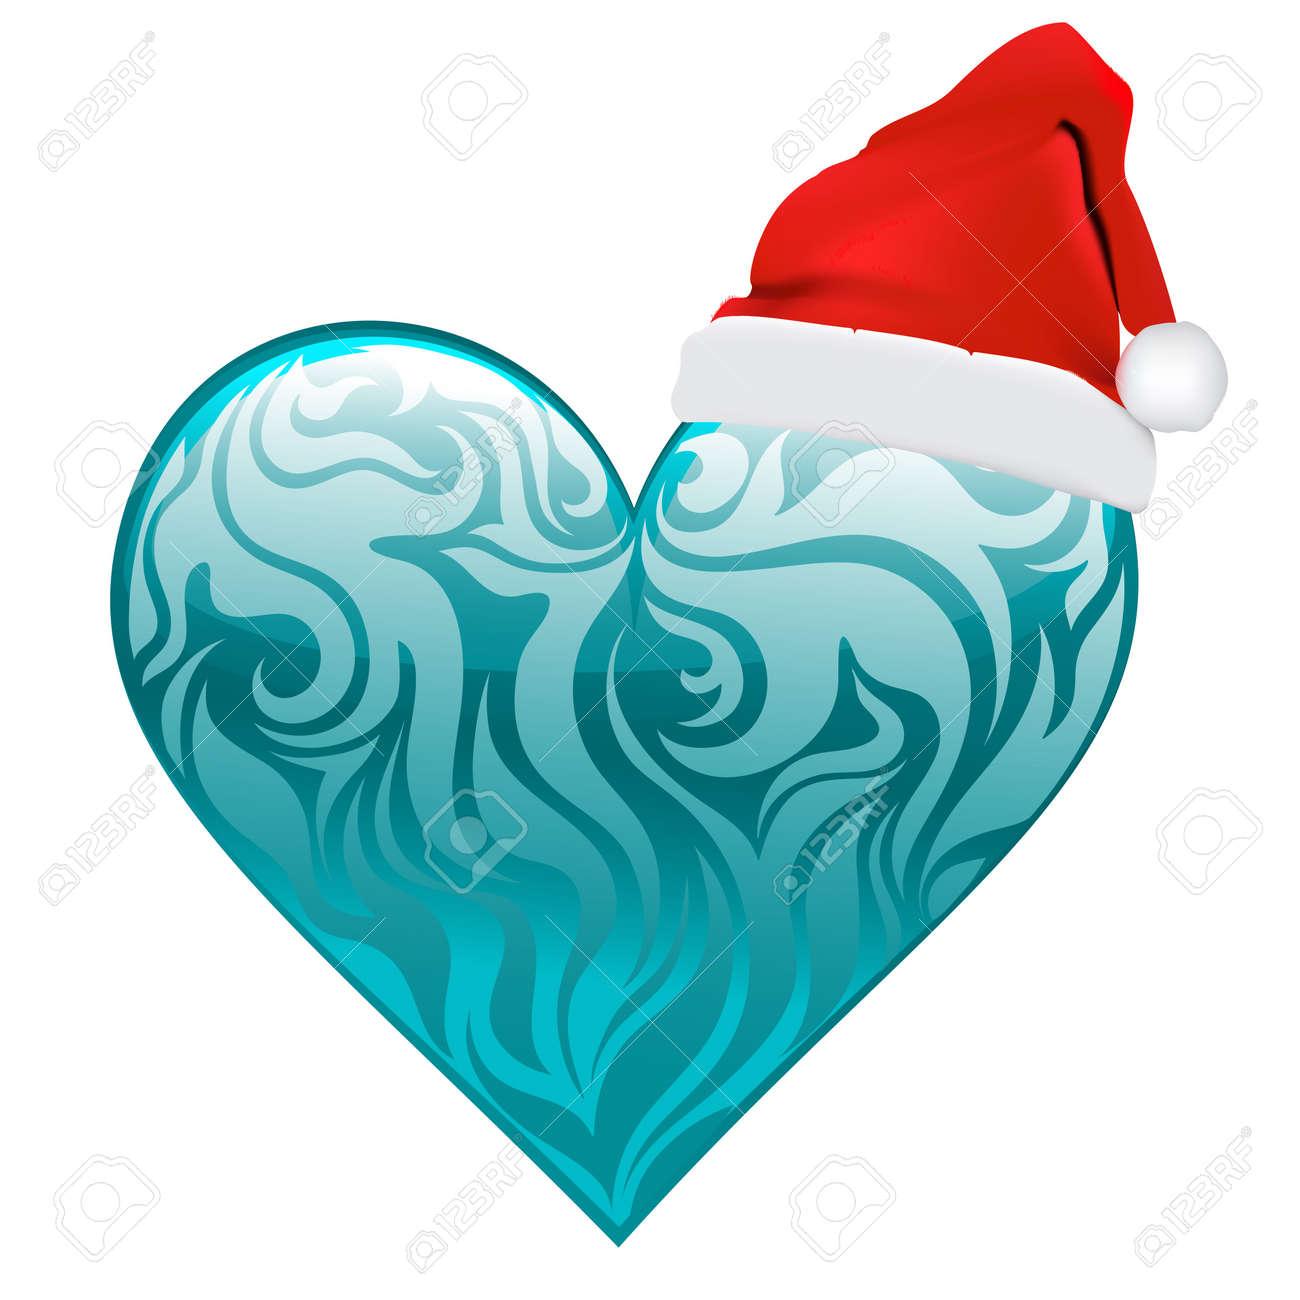 Christmas Heart Vector.Christmas Heart Vector Art